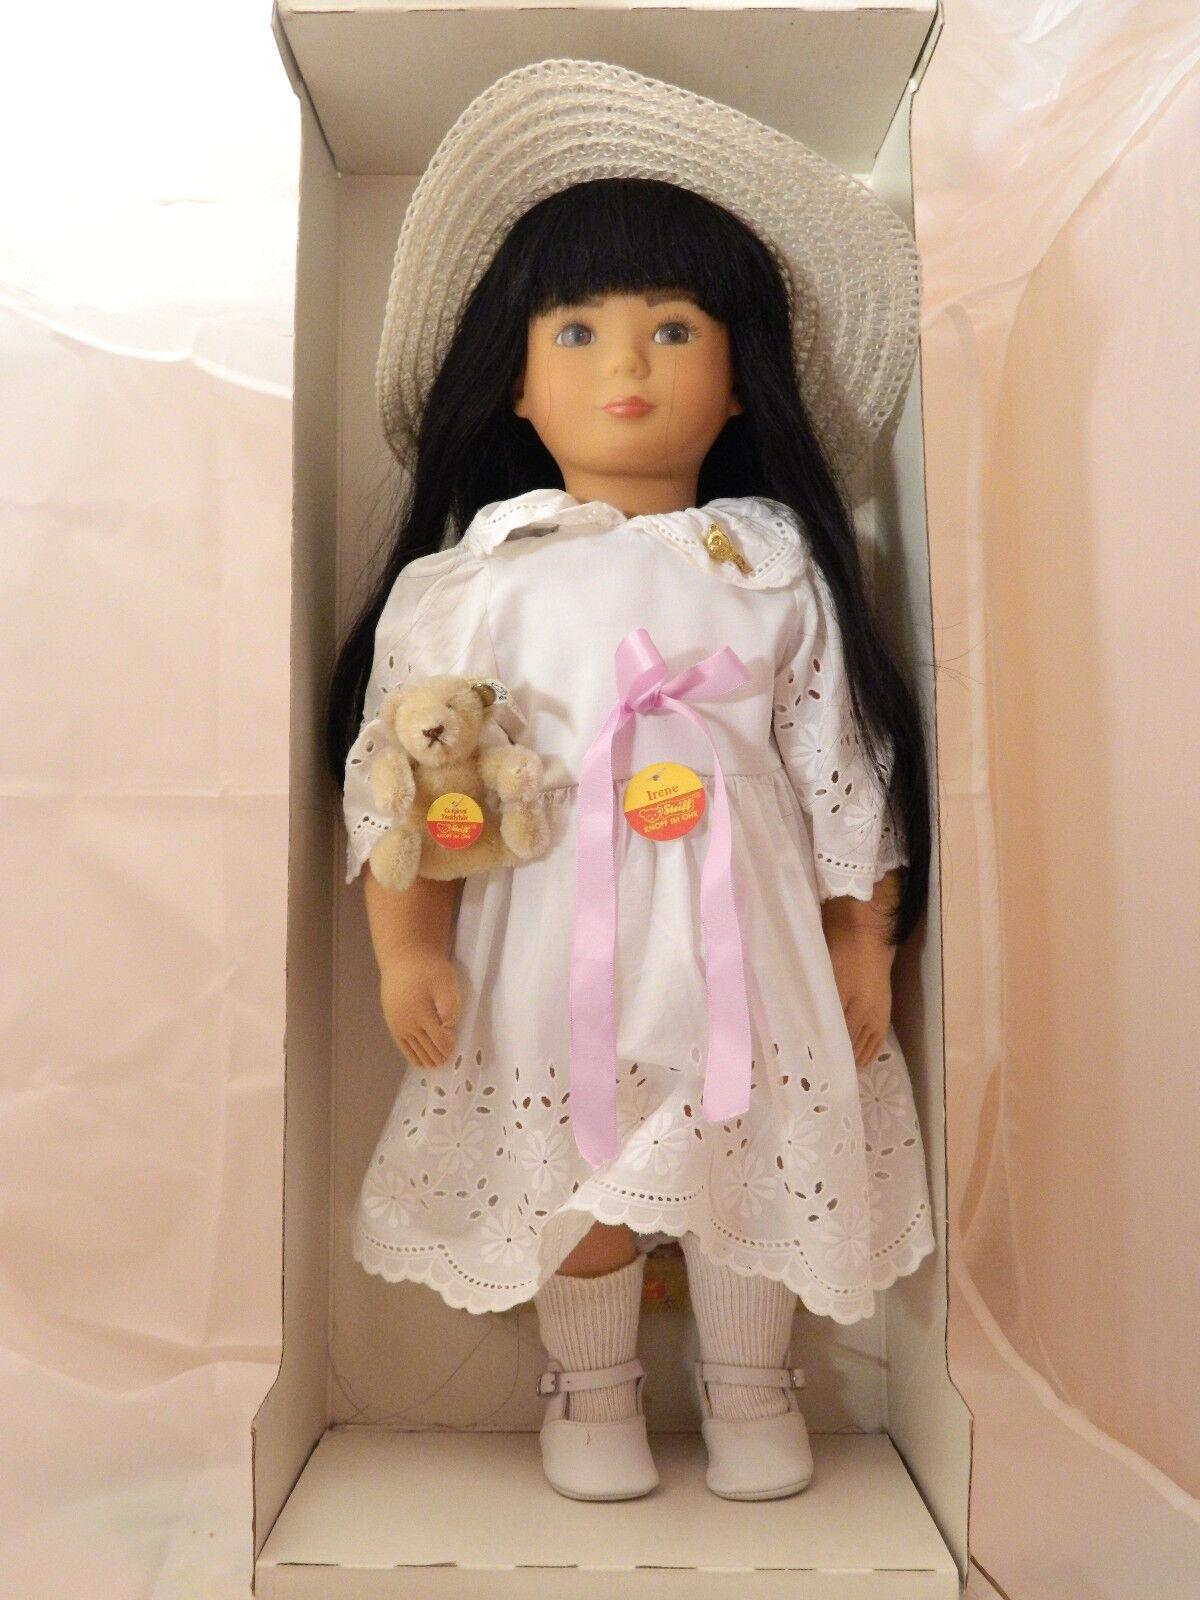 Original Steiff Puppe IRENE mit Teddy   Im Karton & Zertifikat 281 1000